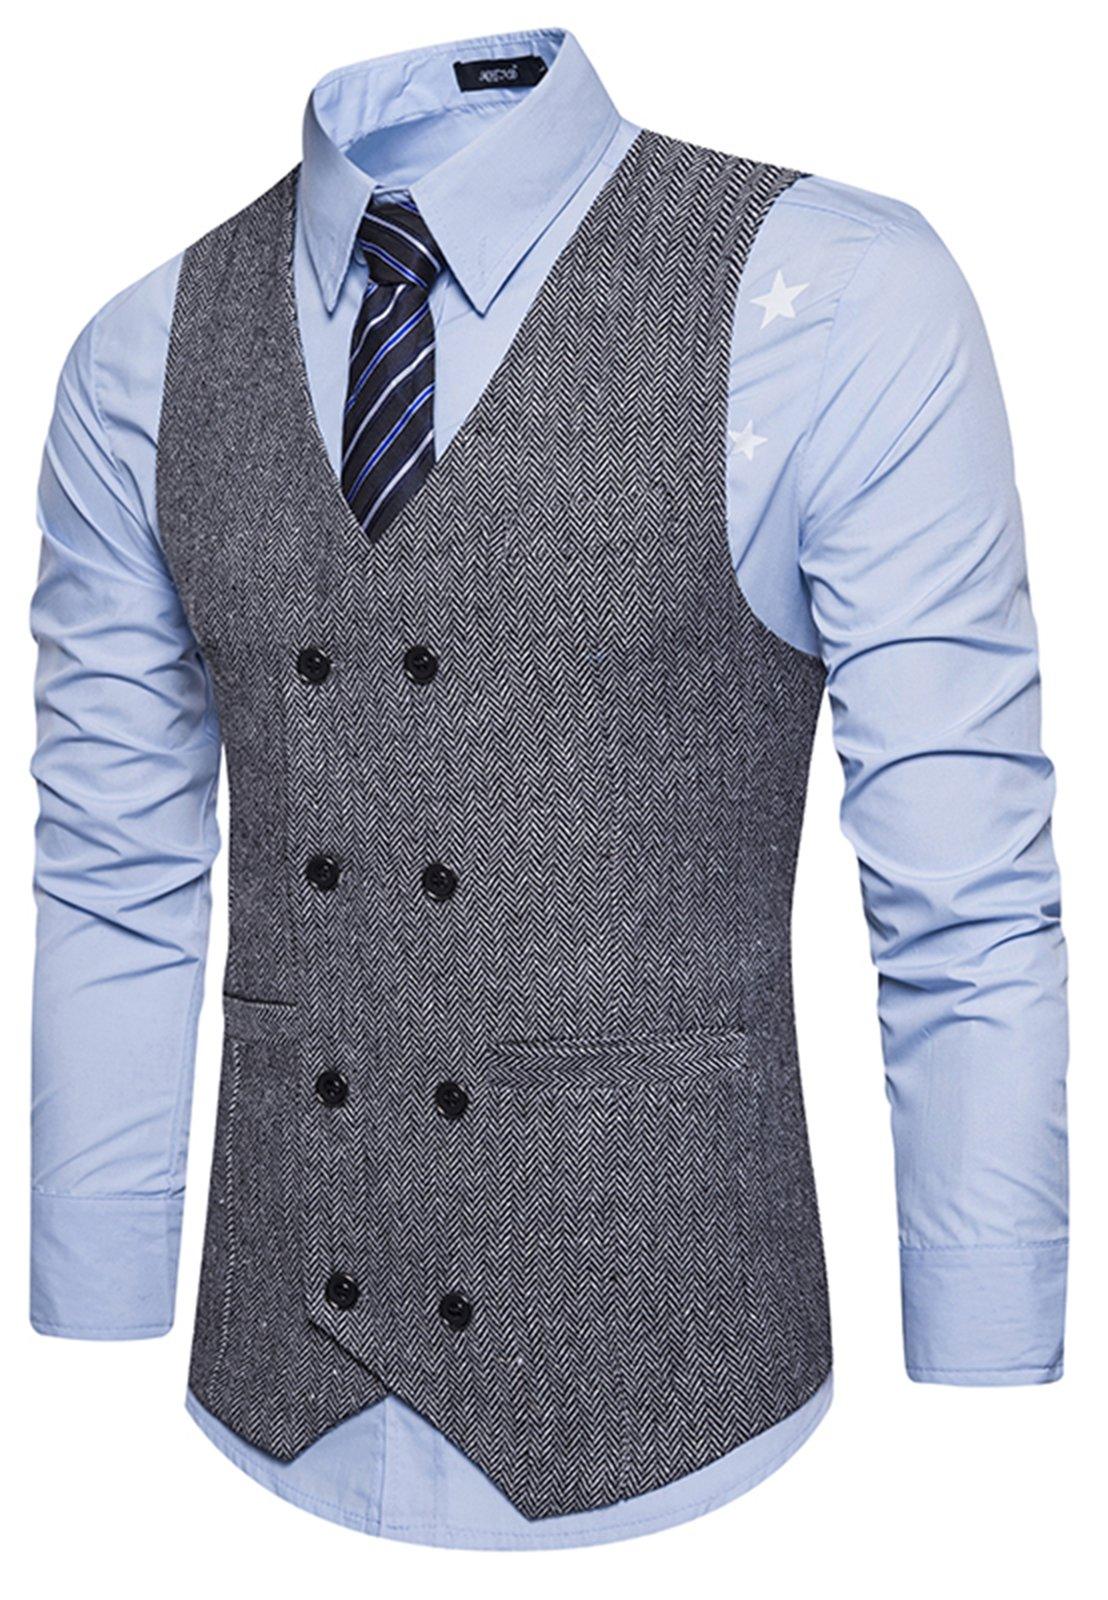 WHATLEES Mens Vintage Slim Fit Double-Breasted Solid Suit Vest B729-Gray-M by WHATLEES